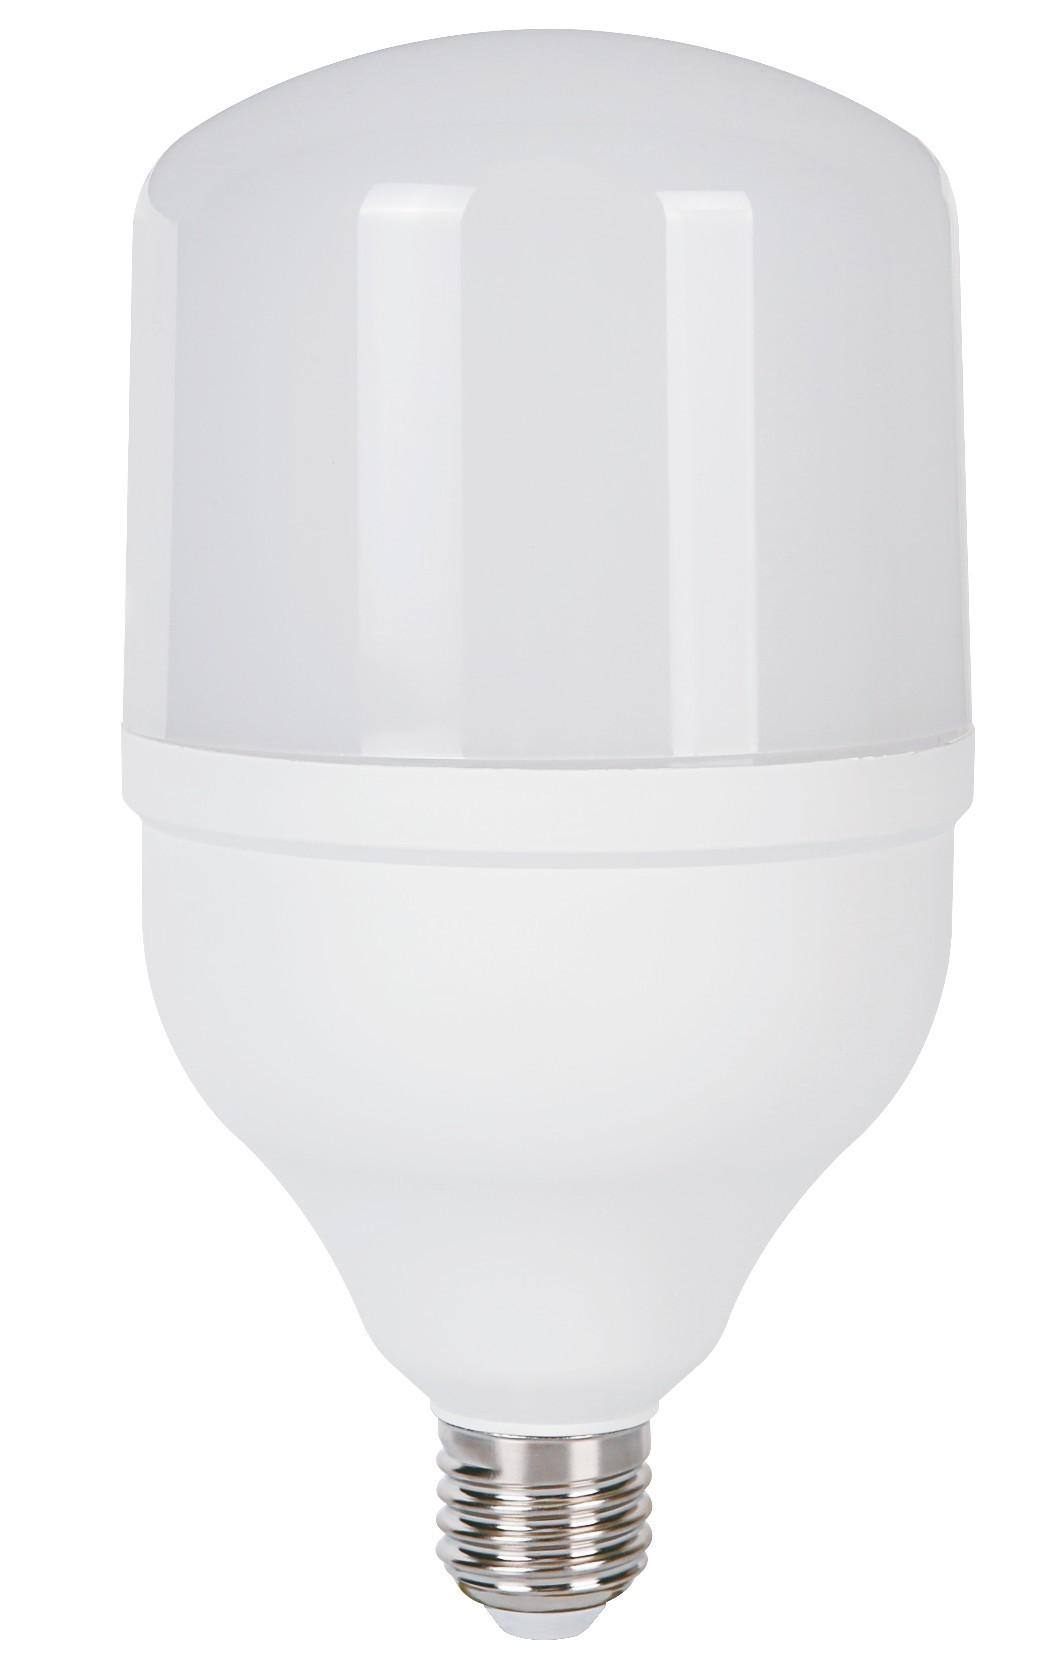 E27 L1030 LED 30W ILUMINACION LAMPARAS JA LED 3000K LAMPARA XkNnOP80w